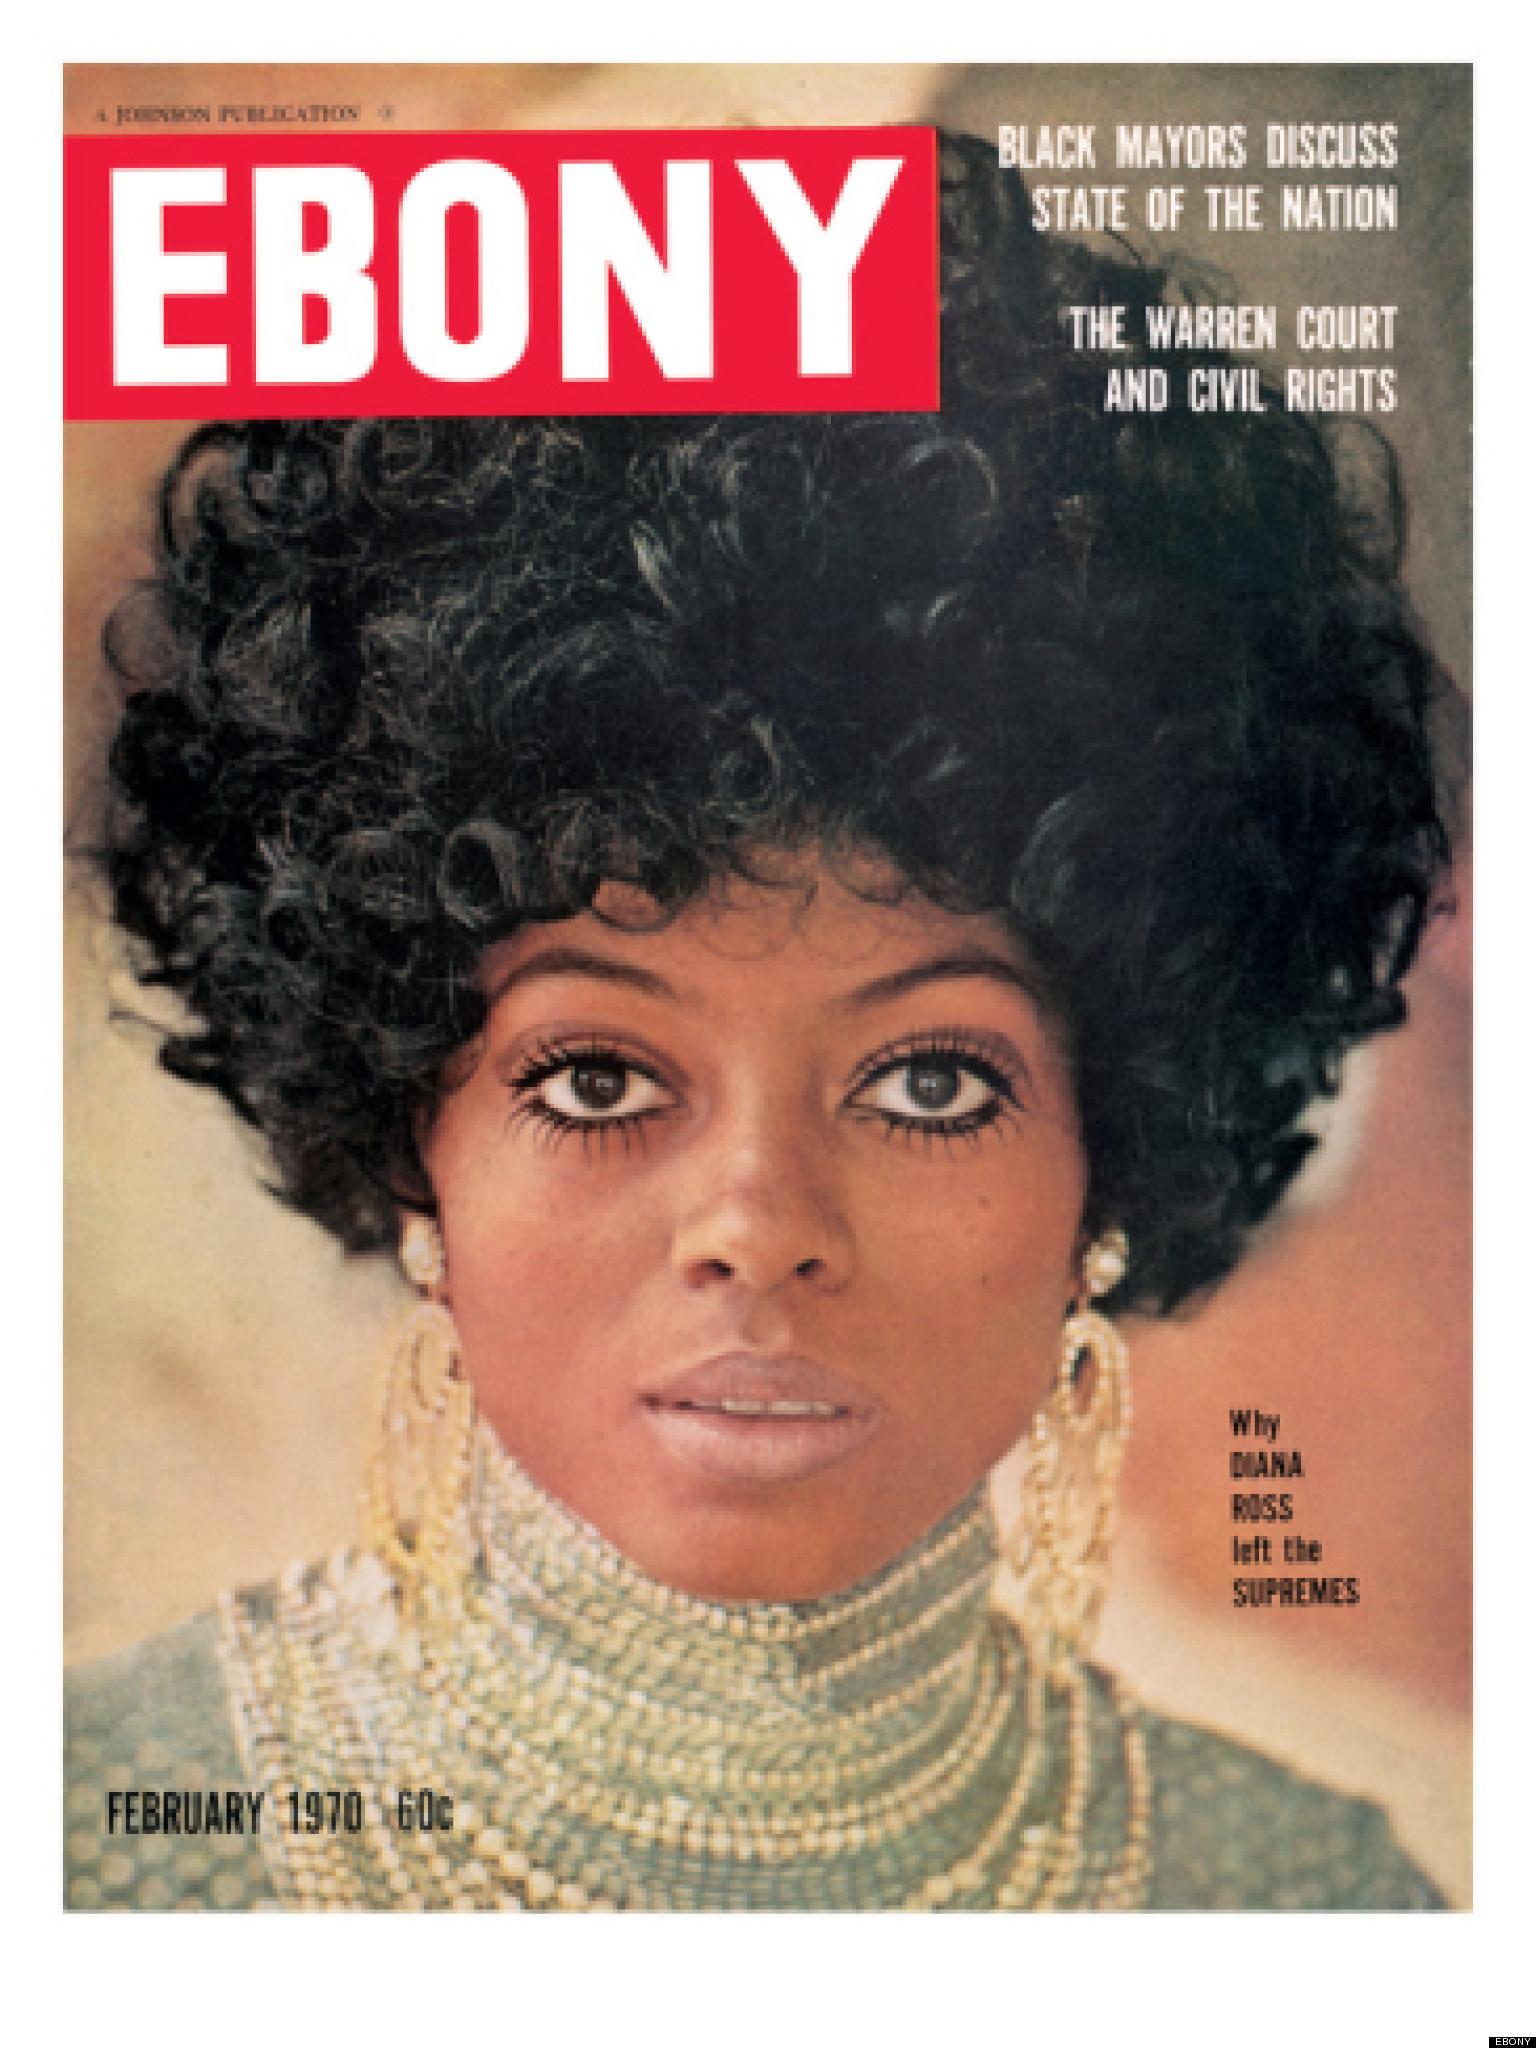 ebony magazine covers: honoring john h. johnson on his 94th birthday